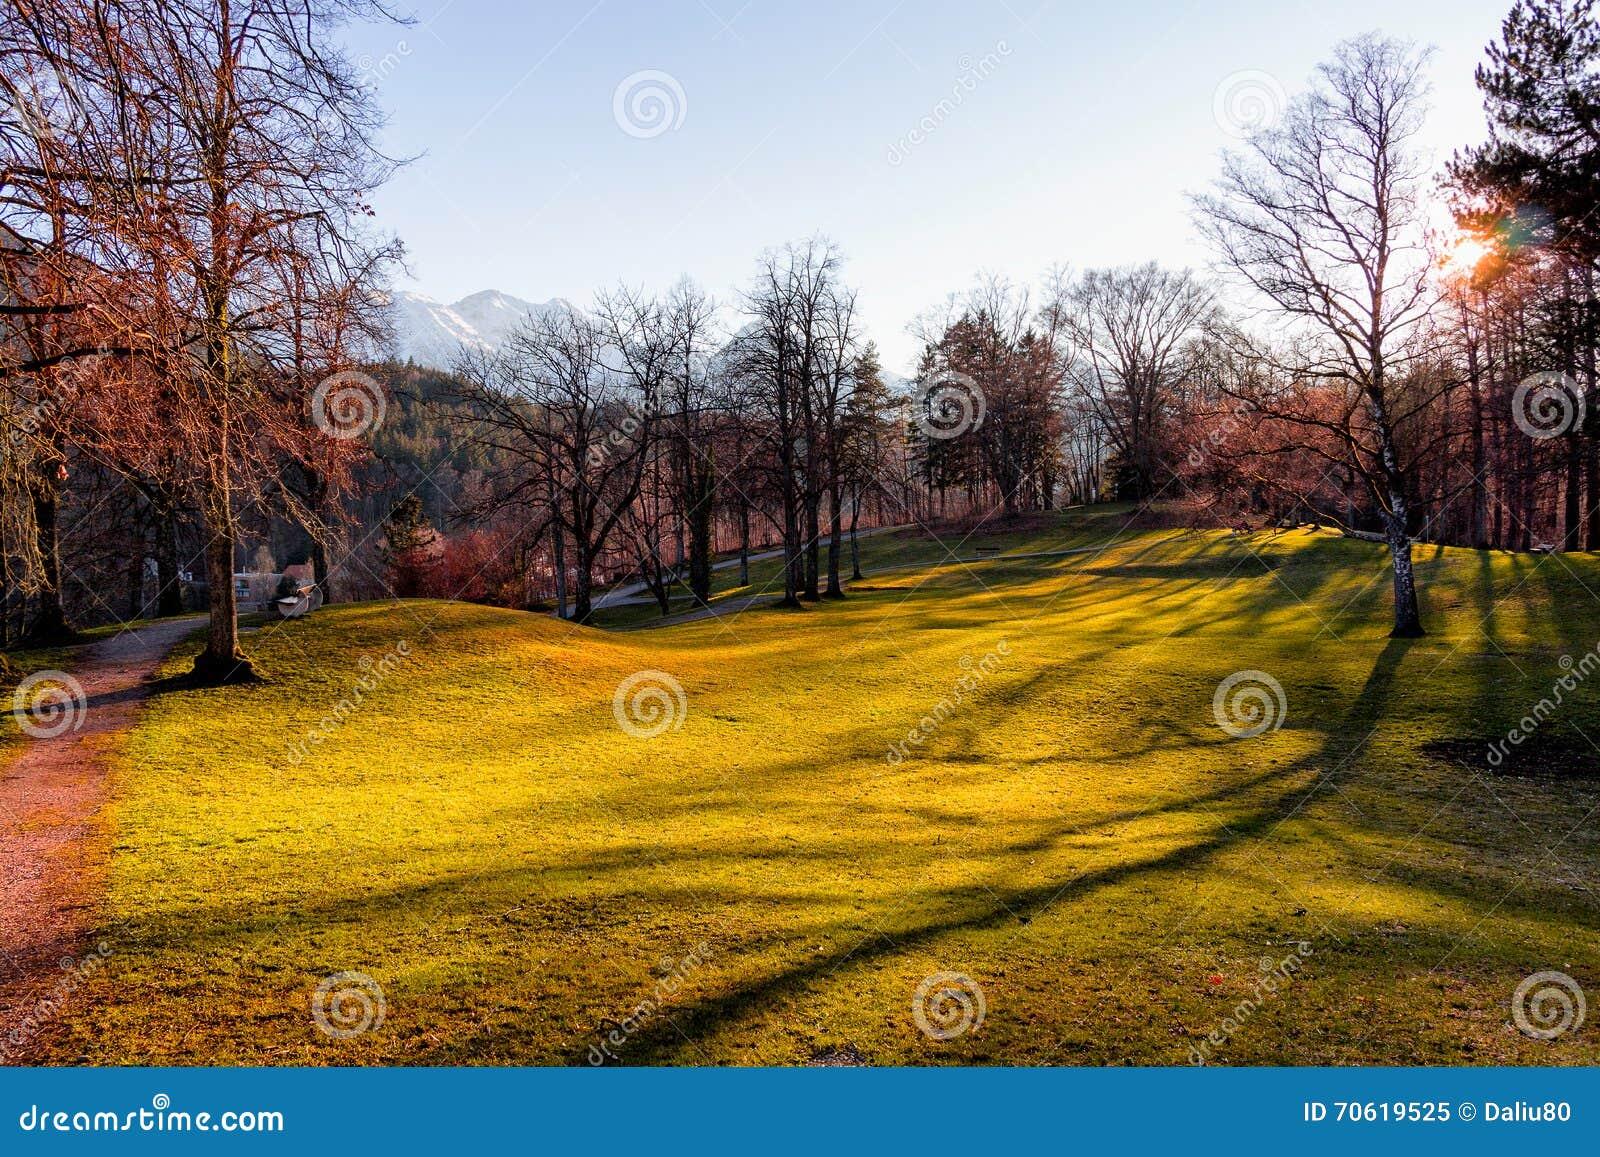 trees germany grass - photo #23